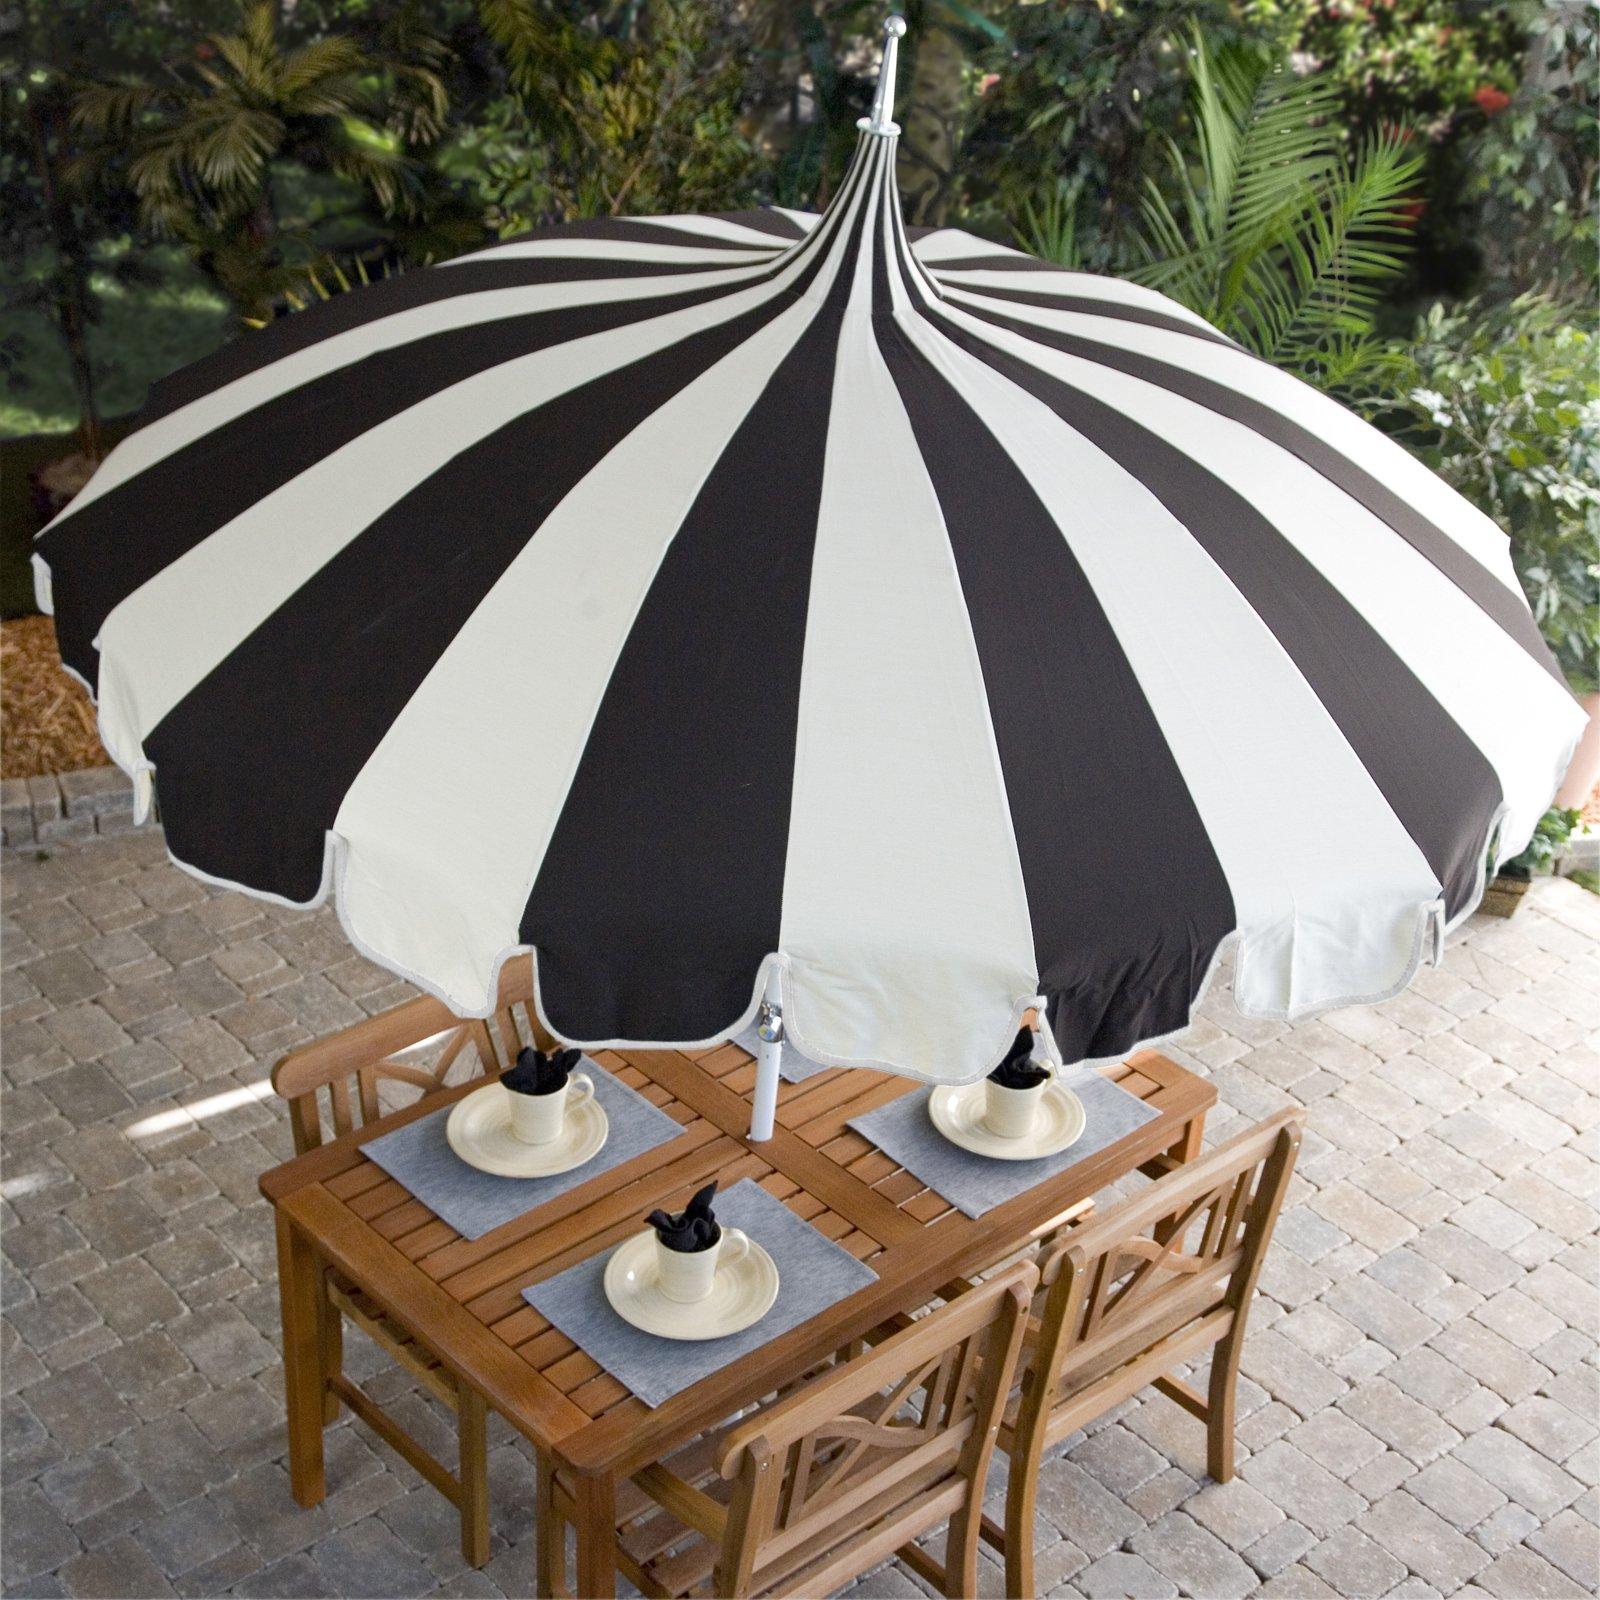 Садовый зонт круглый